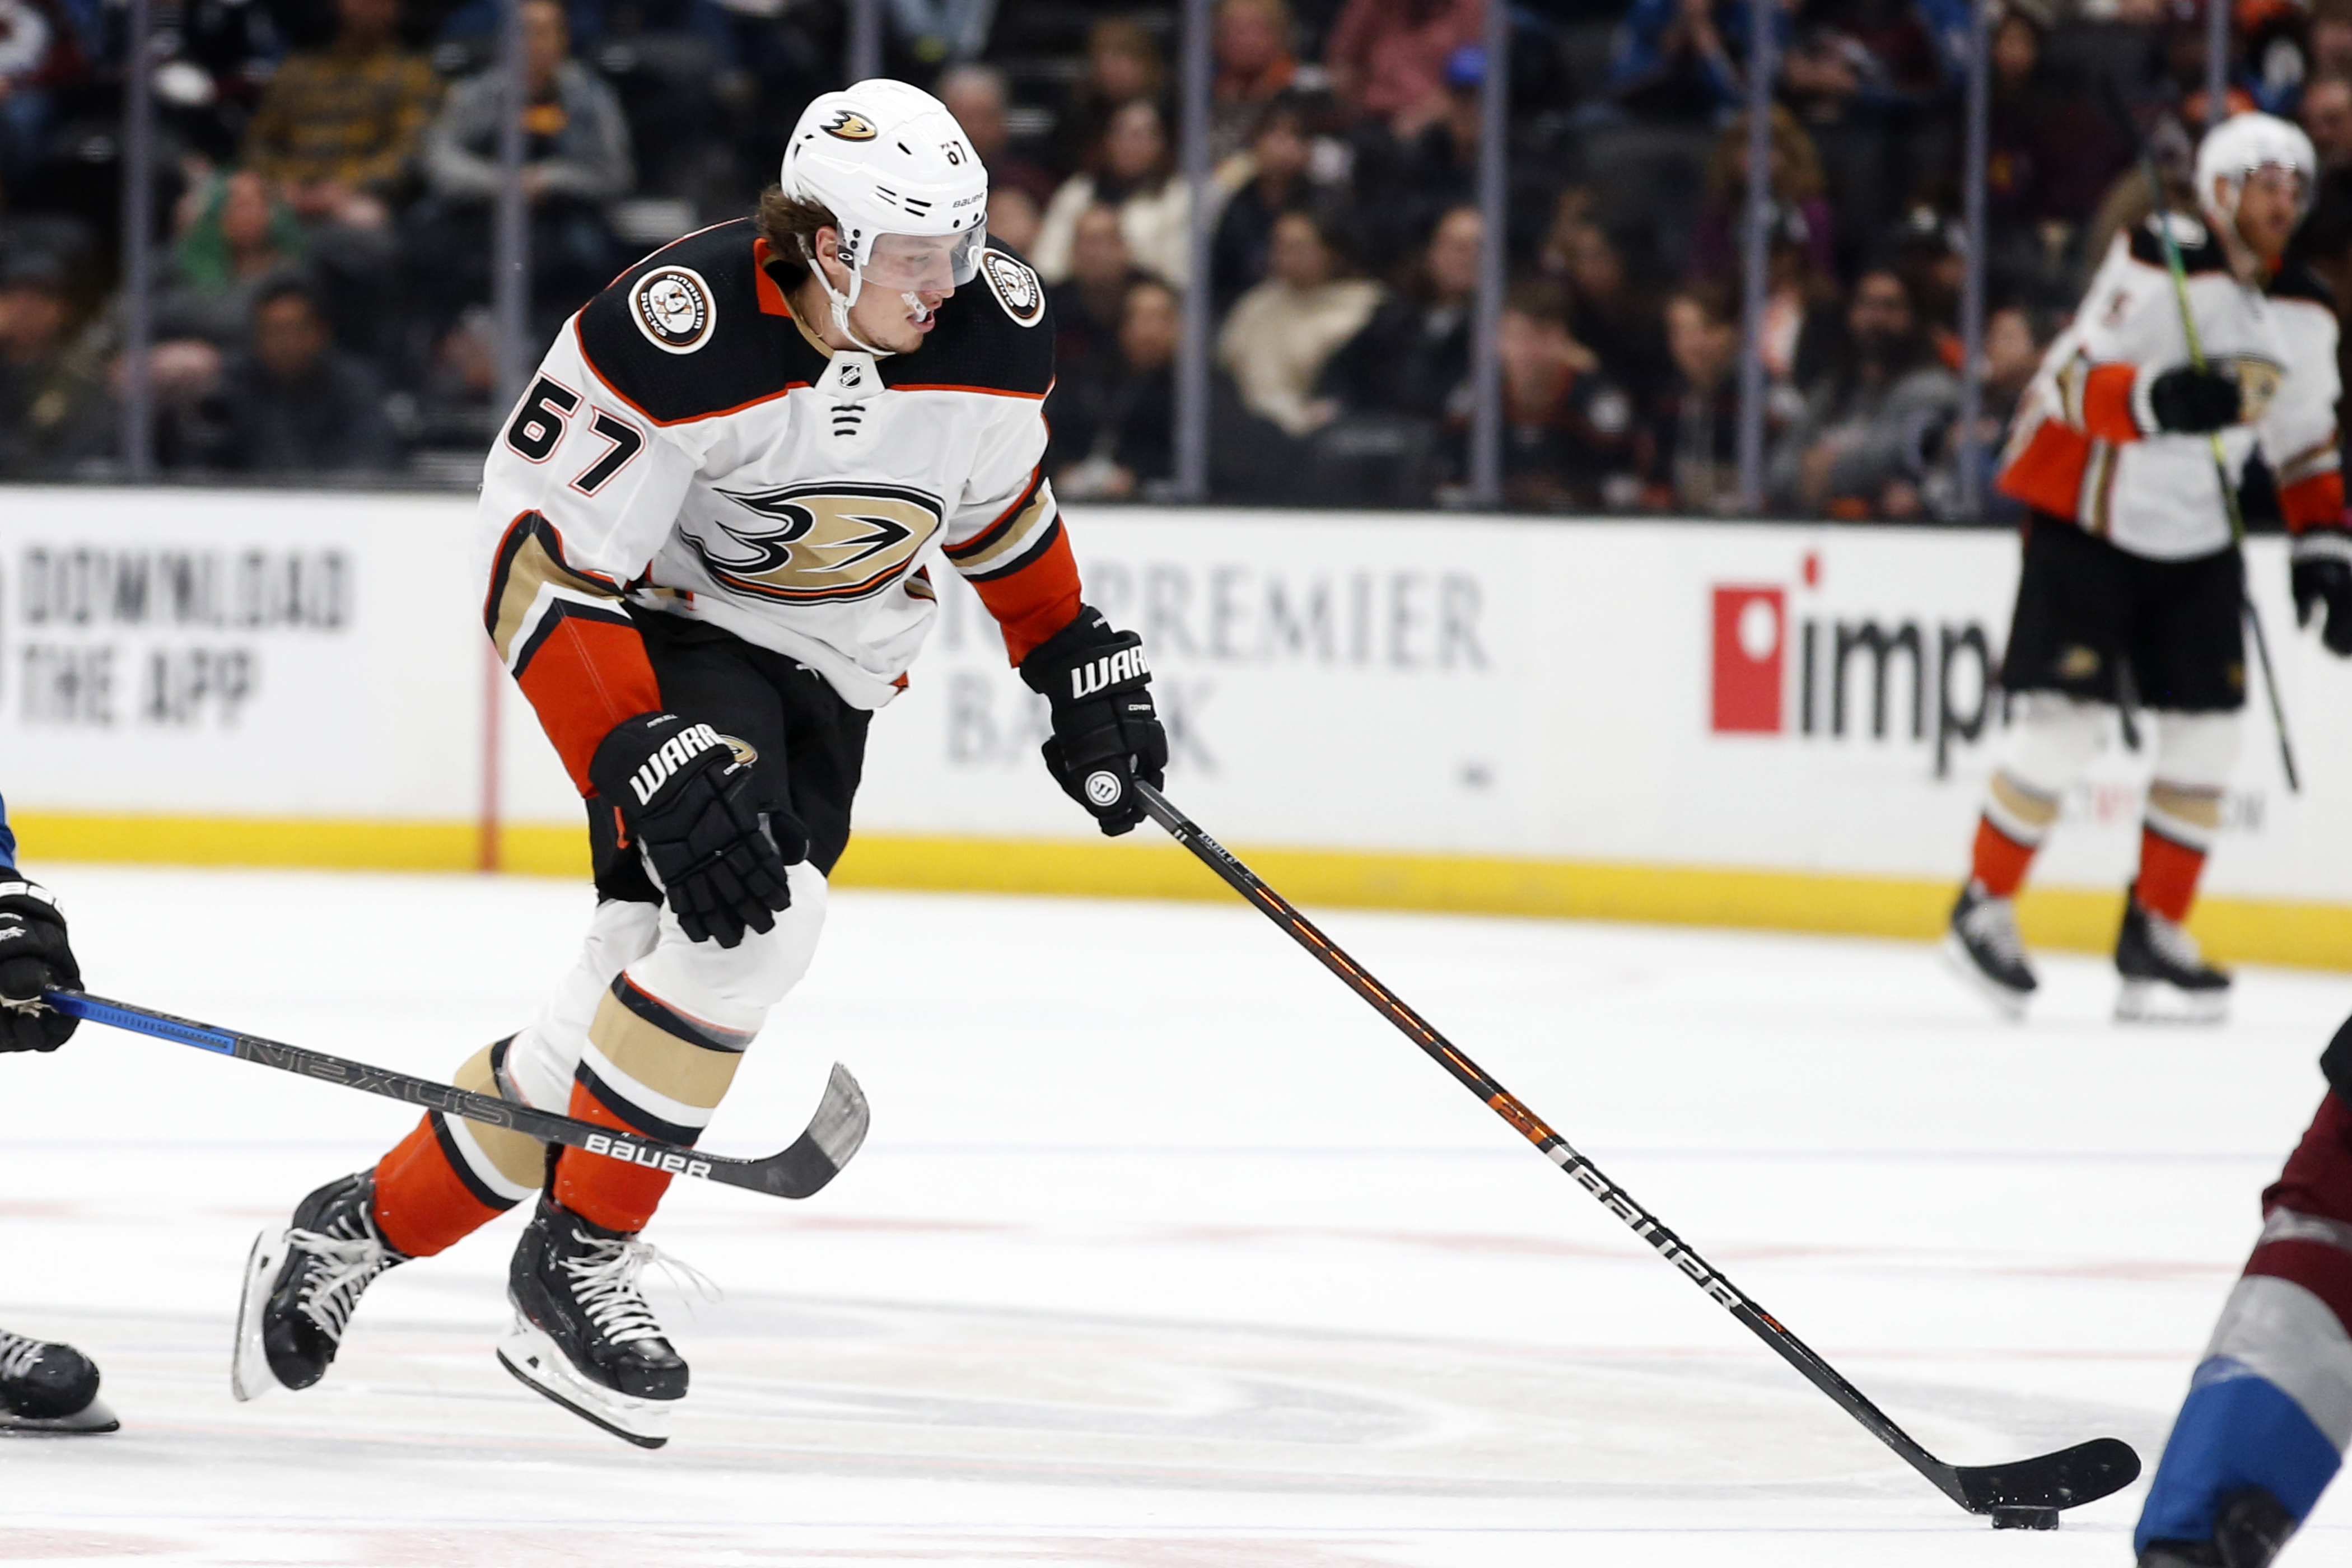 Colorado Avalanche v Anaheim Ducks